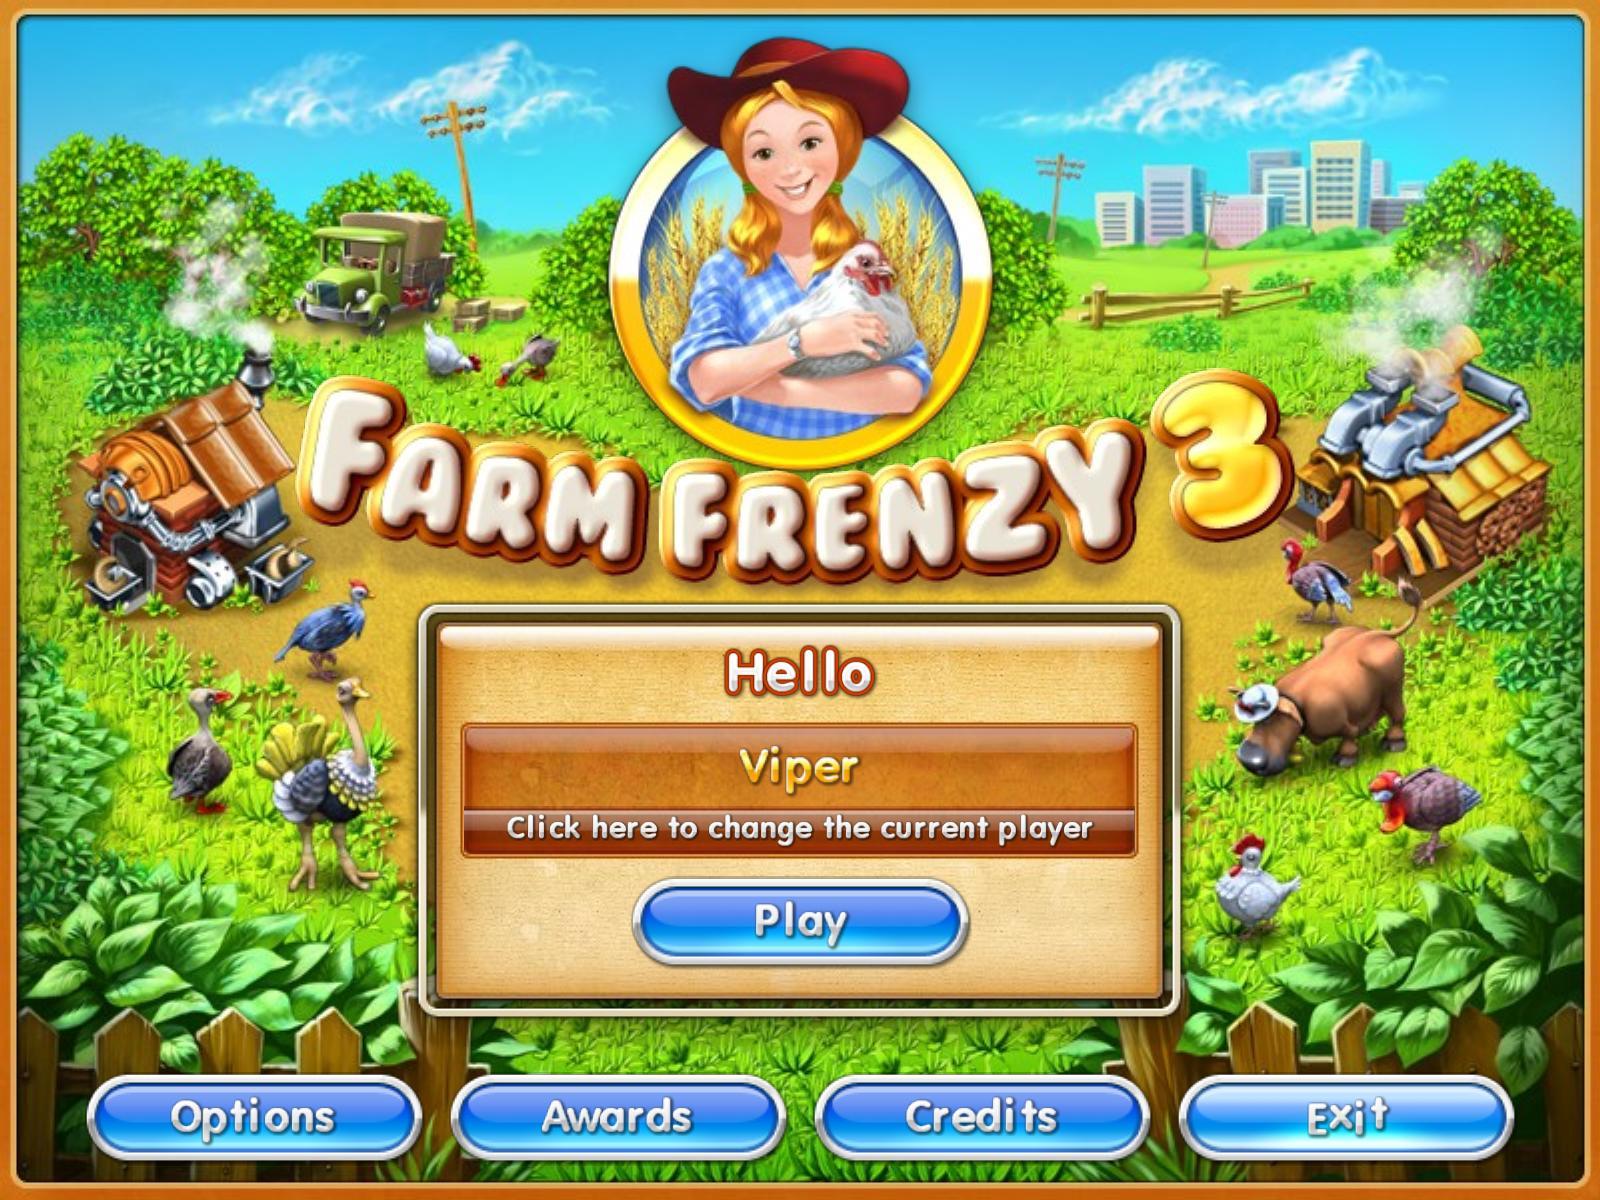 Farm frenzy go fishing online dating